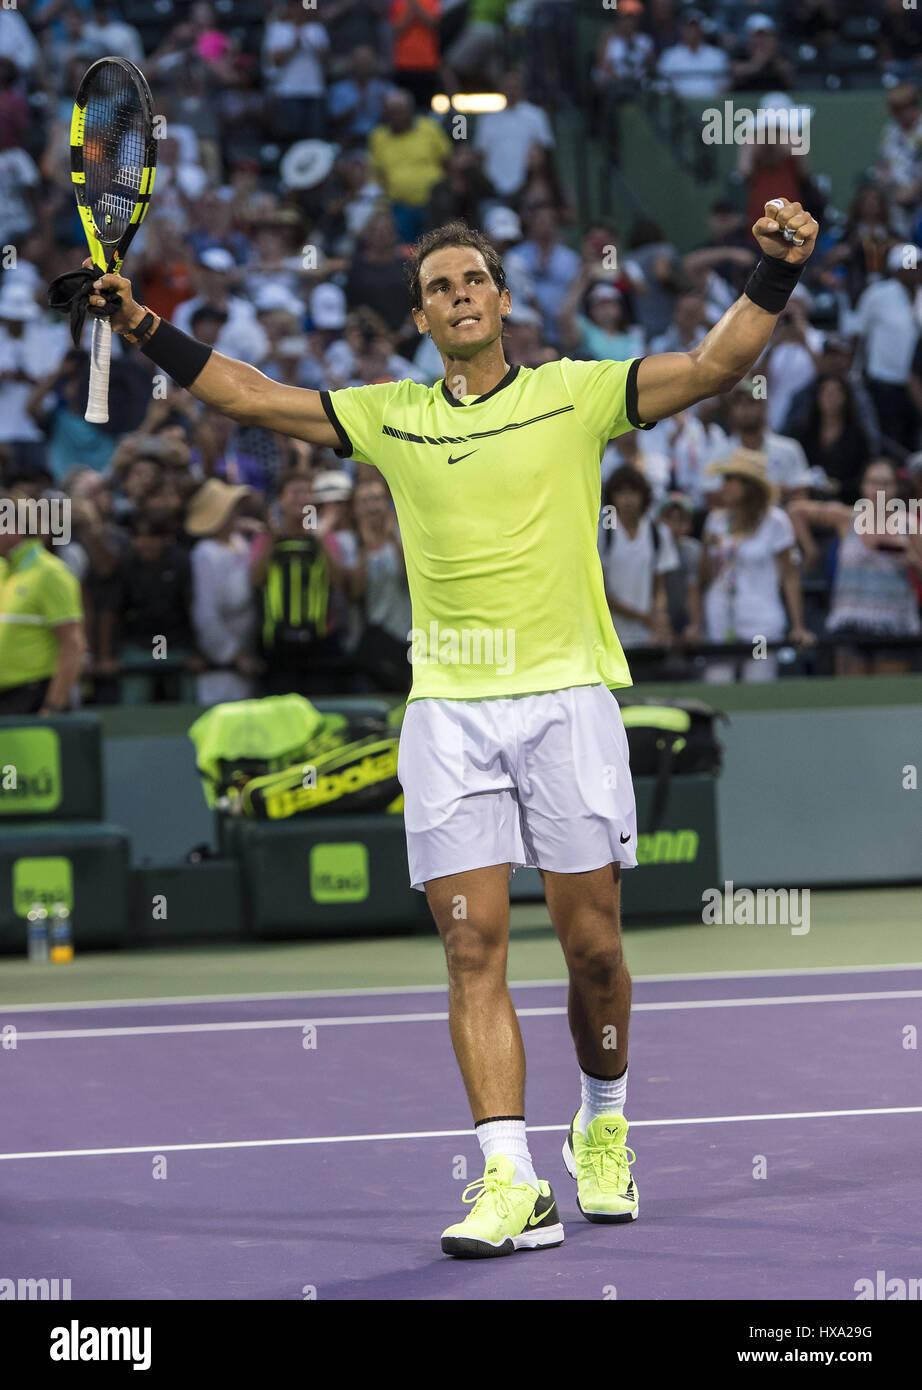 Miami, FL, EEUU. 26 Mar, 2017. Marzo, 26 - MIAMI, FL: Rafael Nadal(ESP) celebrando aquí Philipp Kohlschreiber(GER) Foto de stock